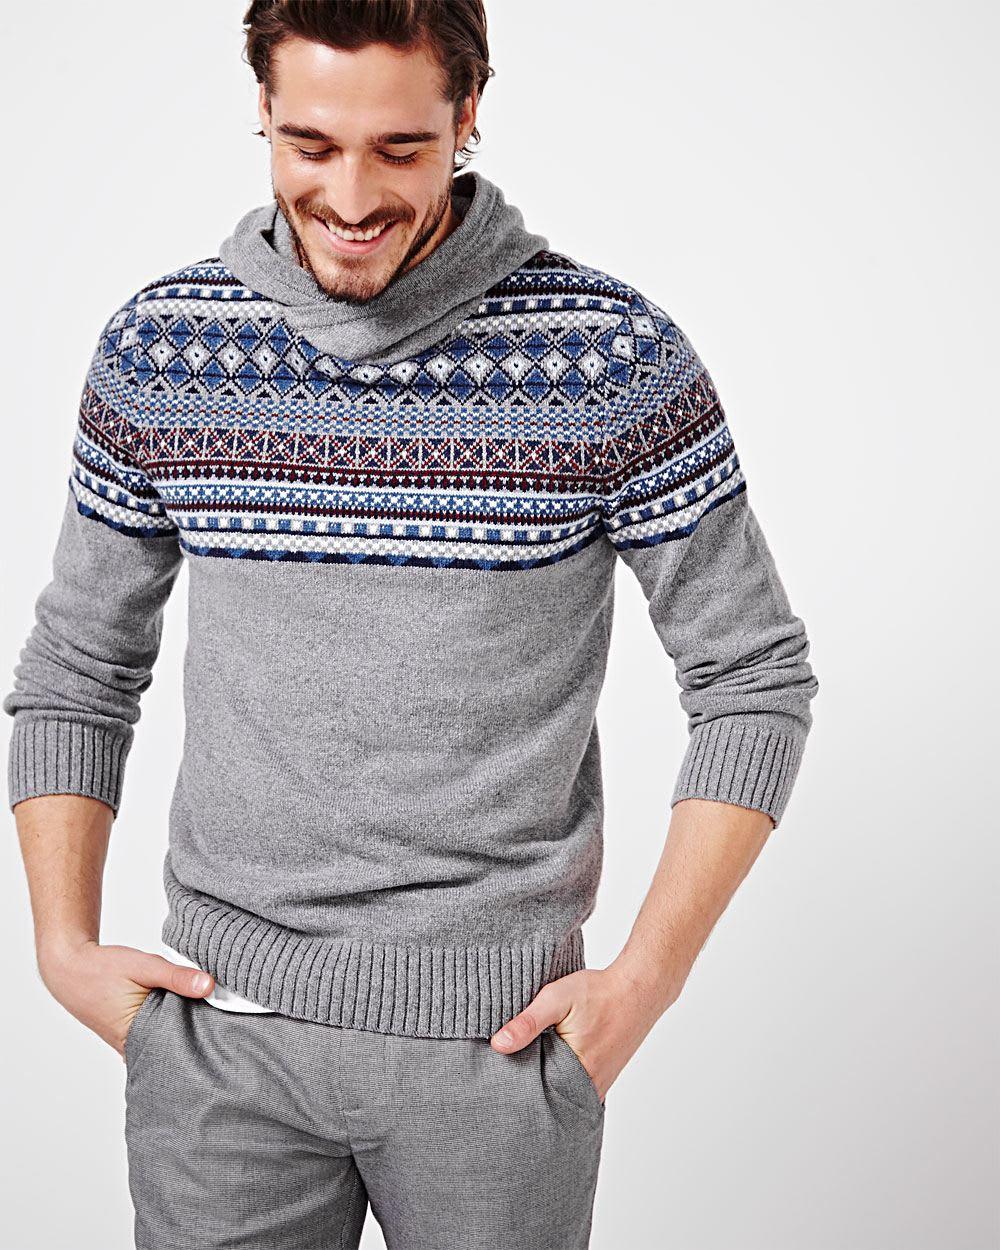 Fair isle hooded sweater | RW&CO.